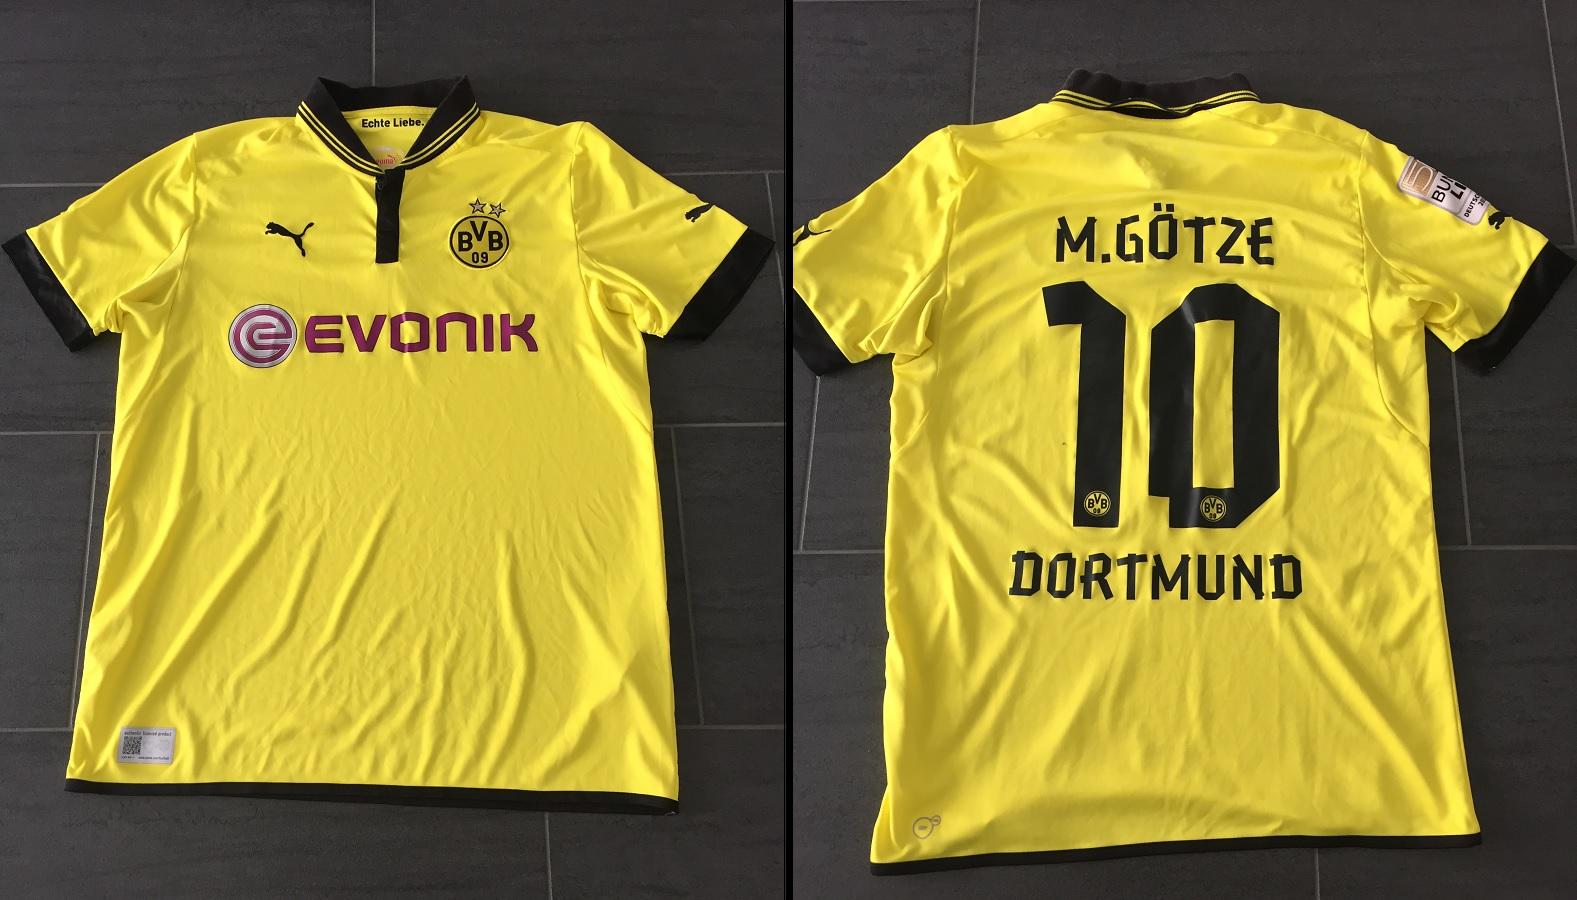 Borussia Dortmund Home 2012/13 Götze